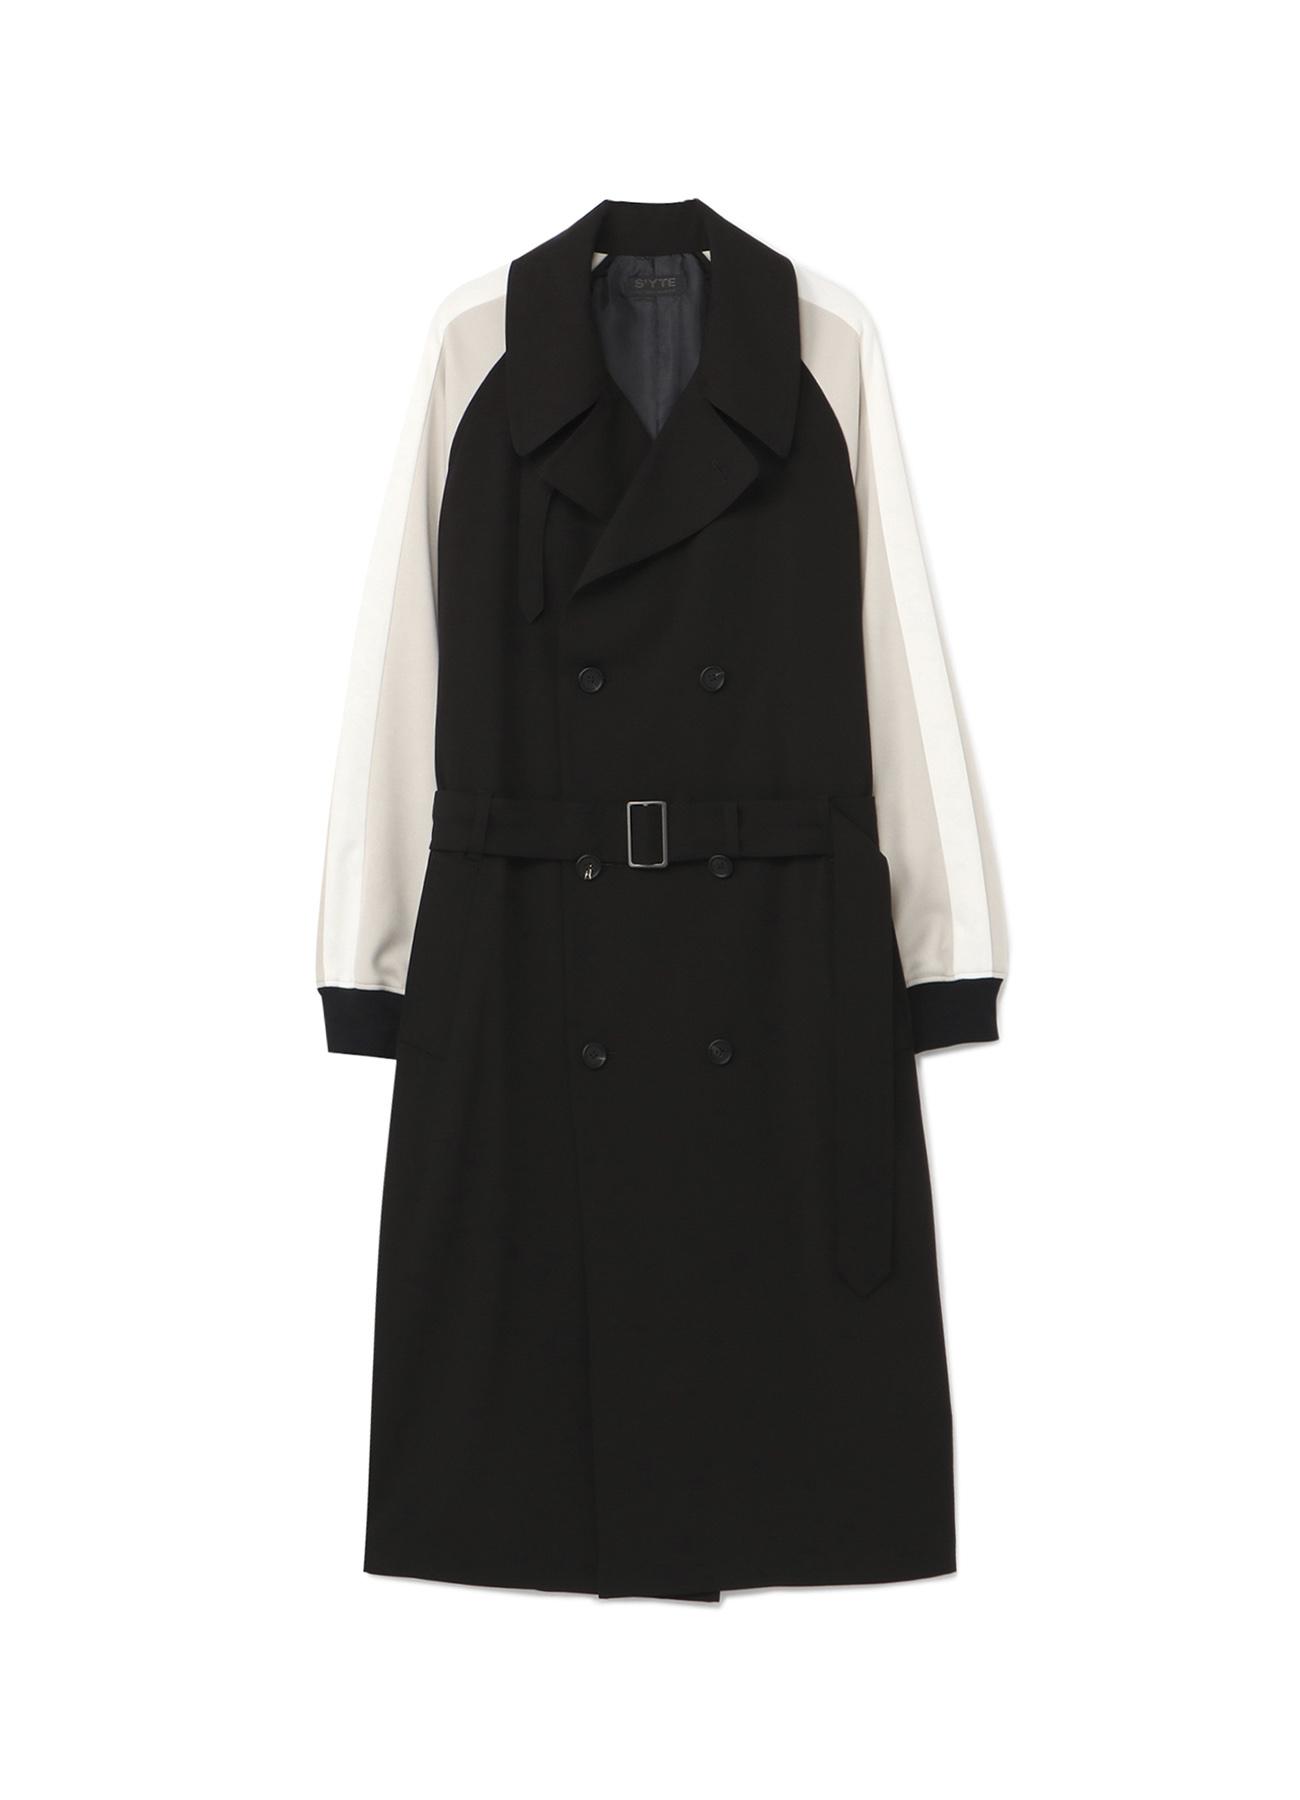 Pe/Rayon Gabardine Stretch Jersey Sleeve Trench Coat